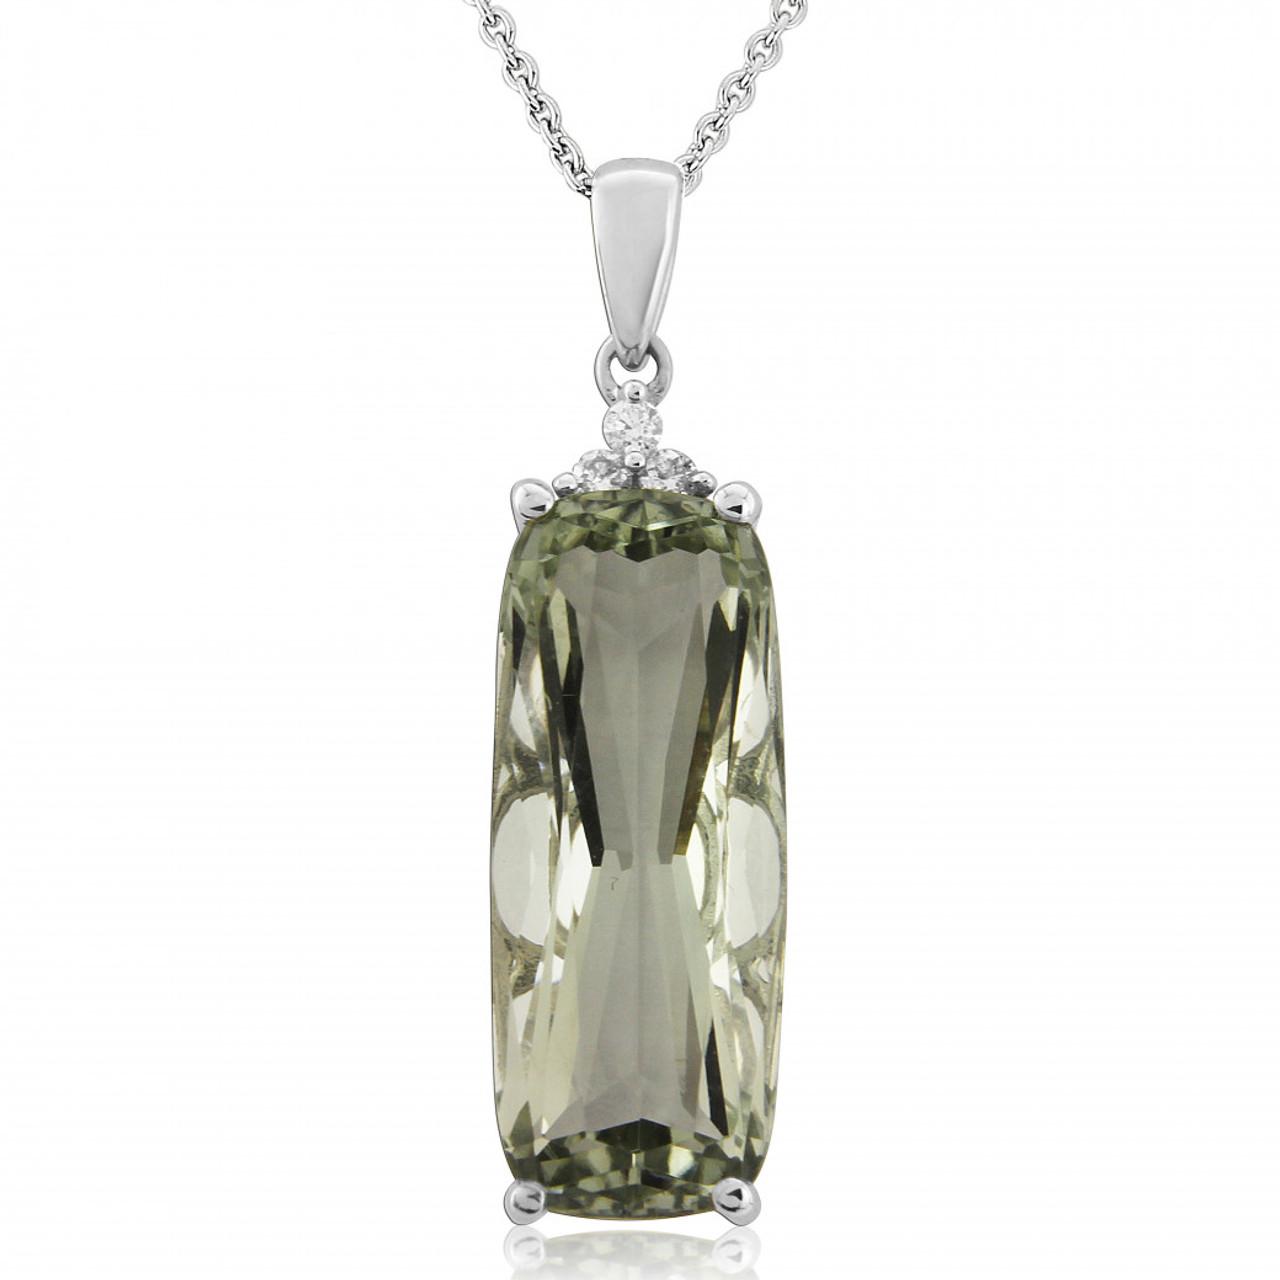 9ct White Gold Diamond & Green Amethyst Pendant Necklace